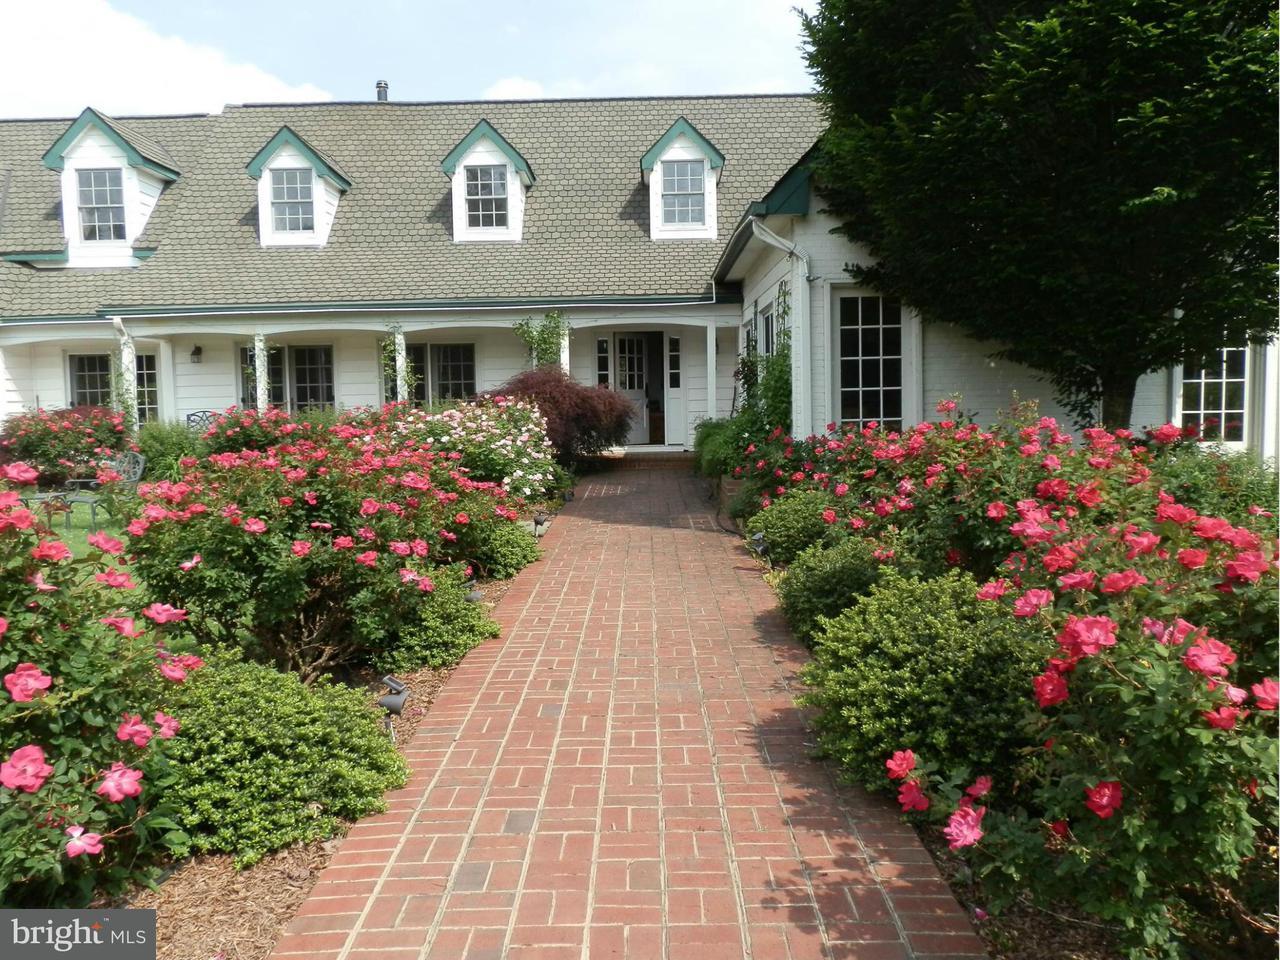 农场 为 销售 在 13310 Del Dios Way 13310 Del Dios Way 库尔佩珀, 弗吉尼亚州 22701 美国